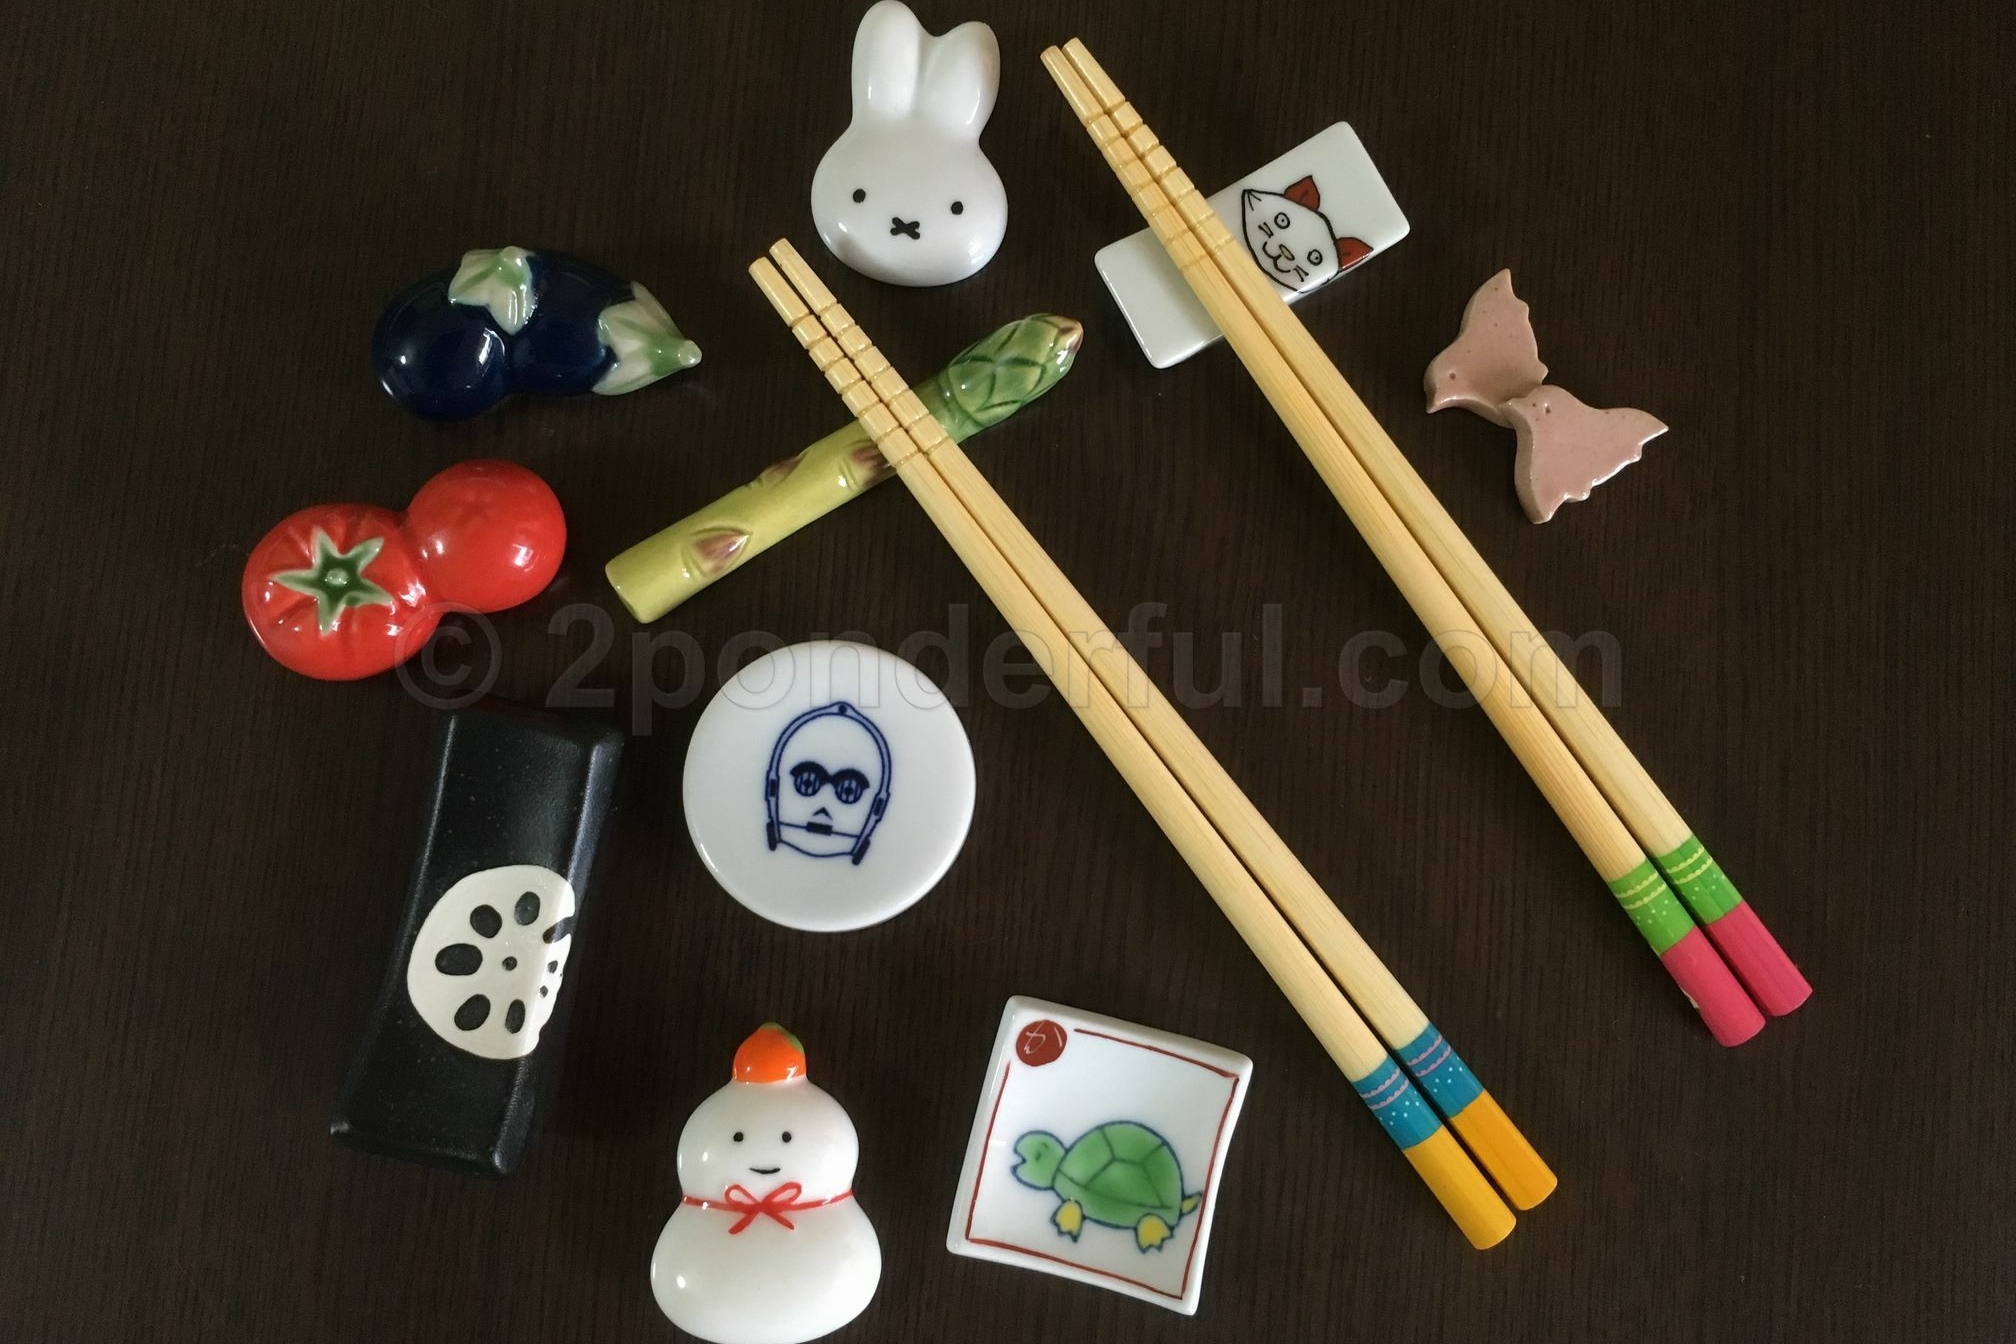 chopstick holder